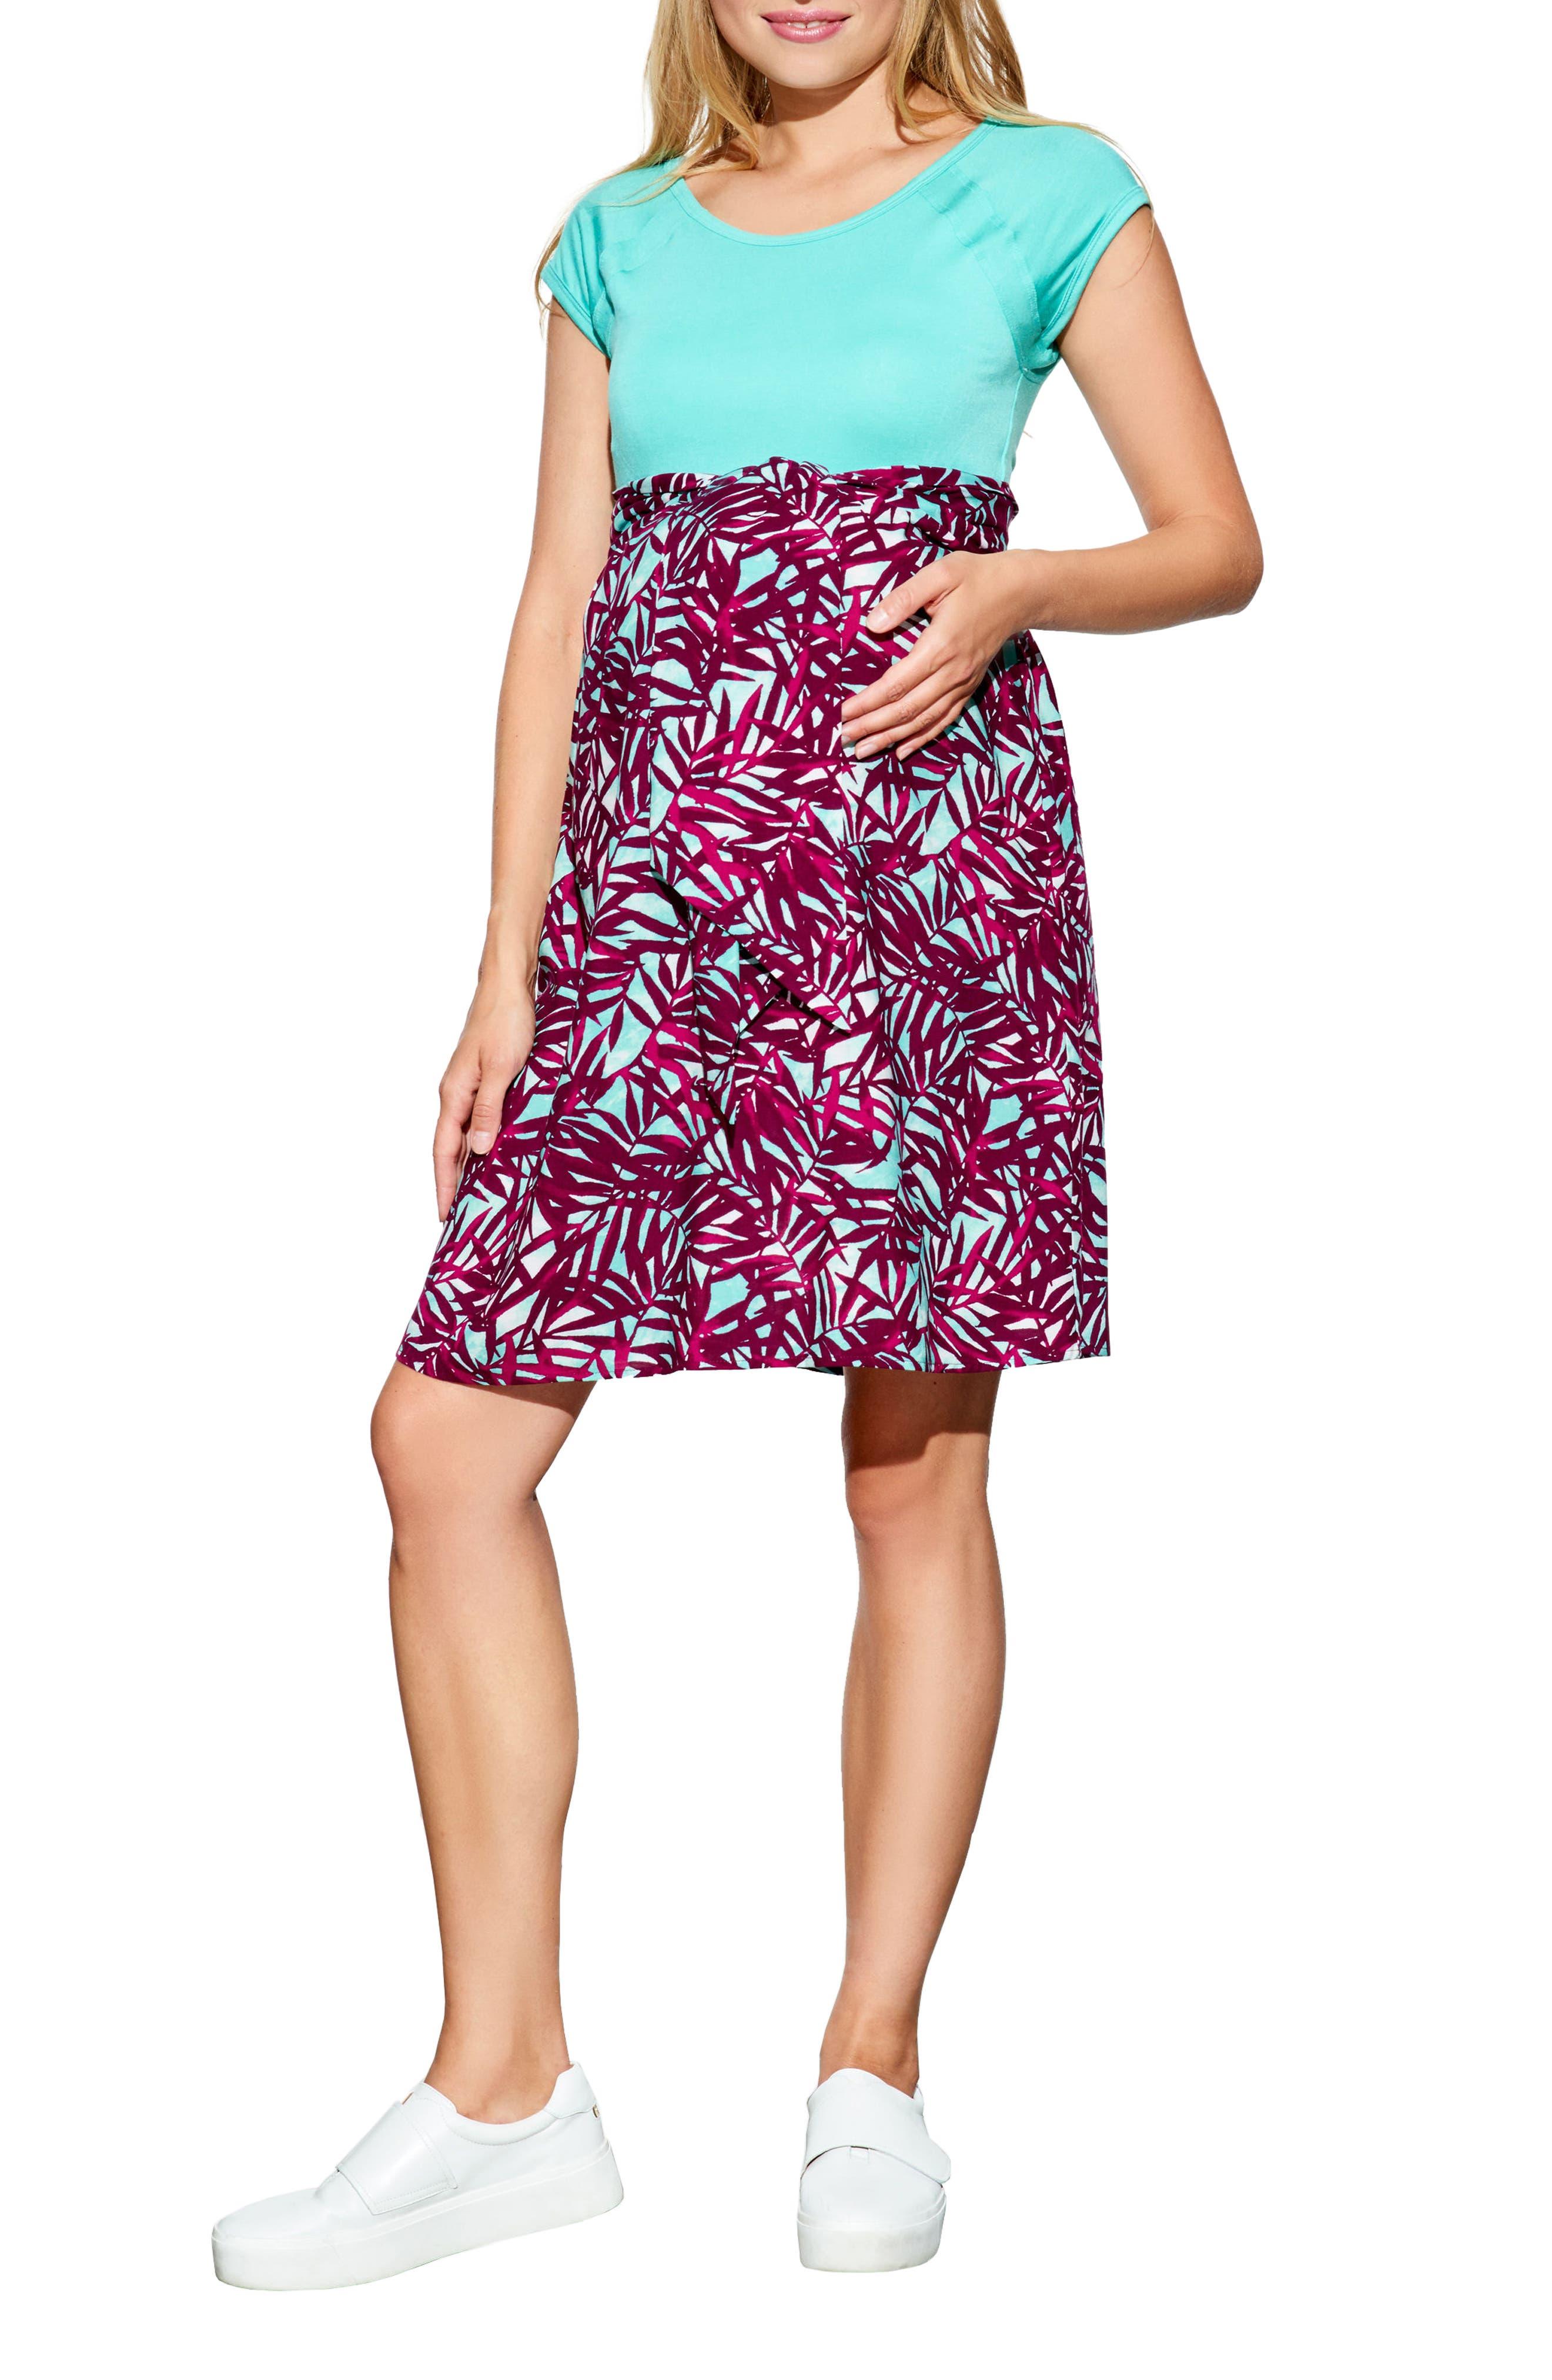 Tie Front Maternity Dress,                             Main thumbnail 1, color,                             MINT/ MAGTRPICS